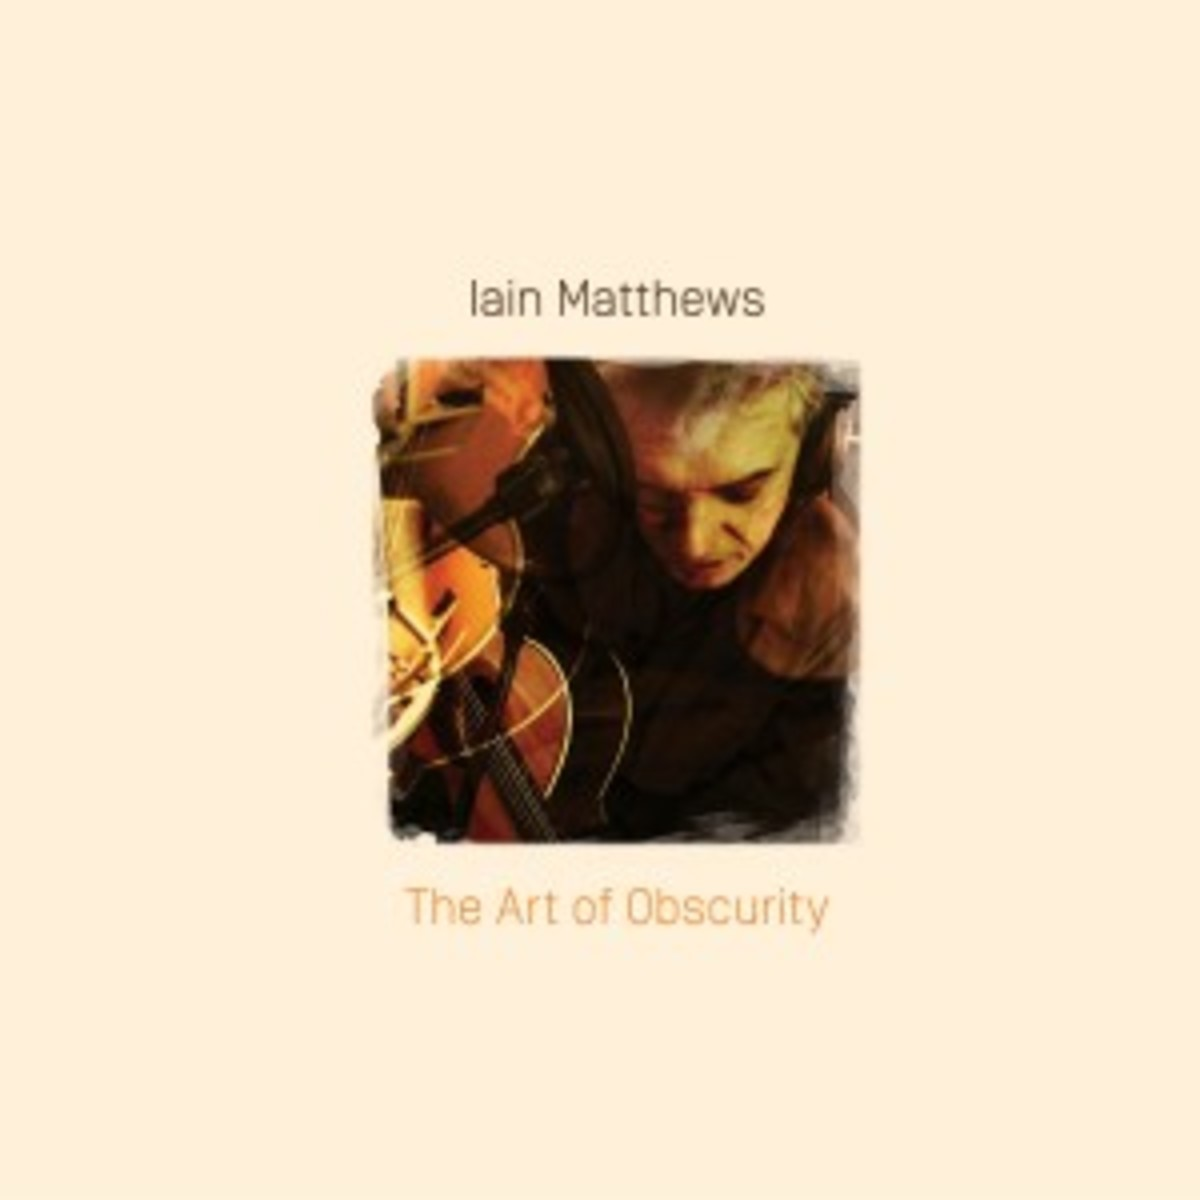 Mathews_Iain_Art_Of_Obscurity_OV-35